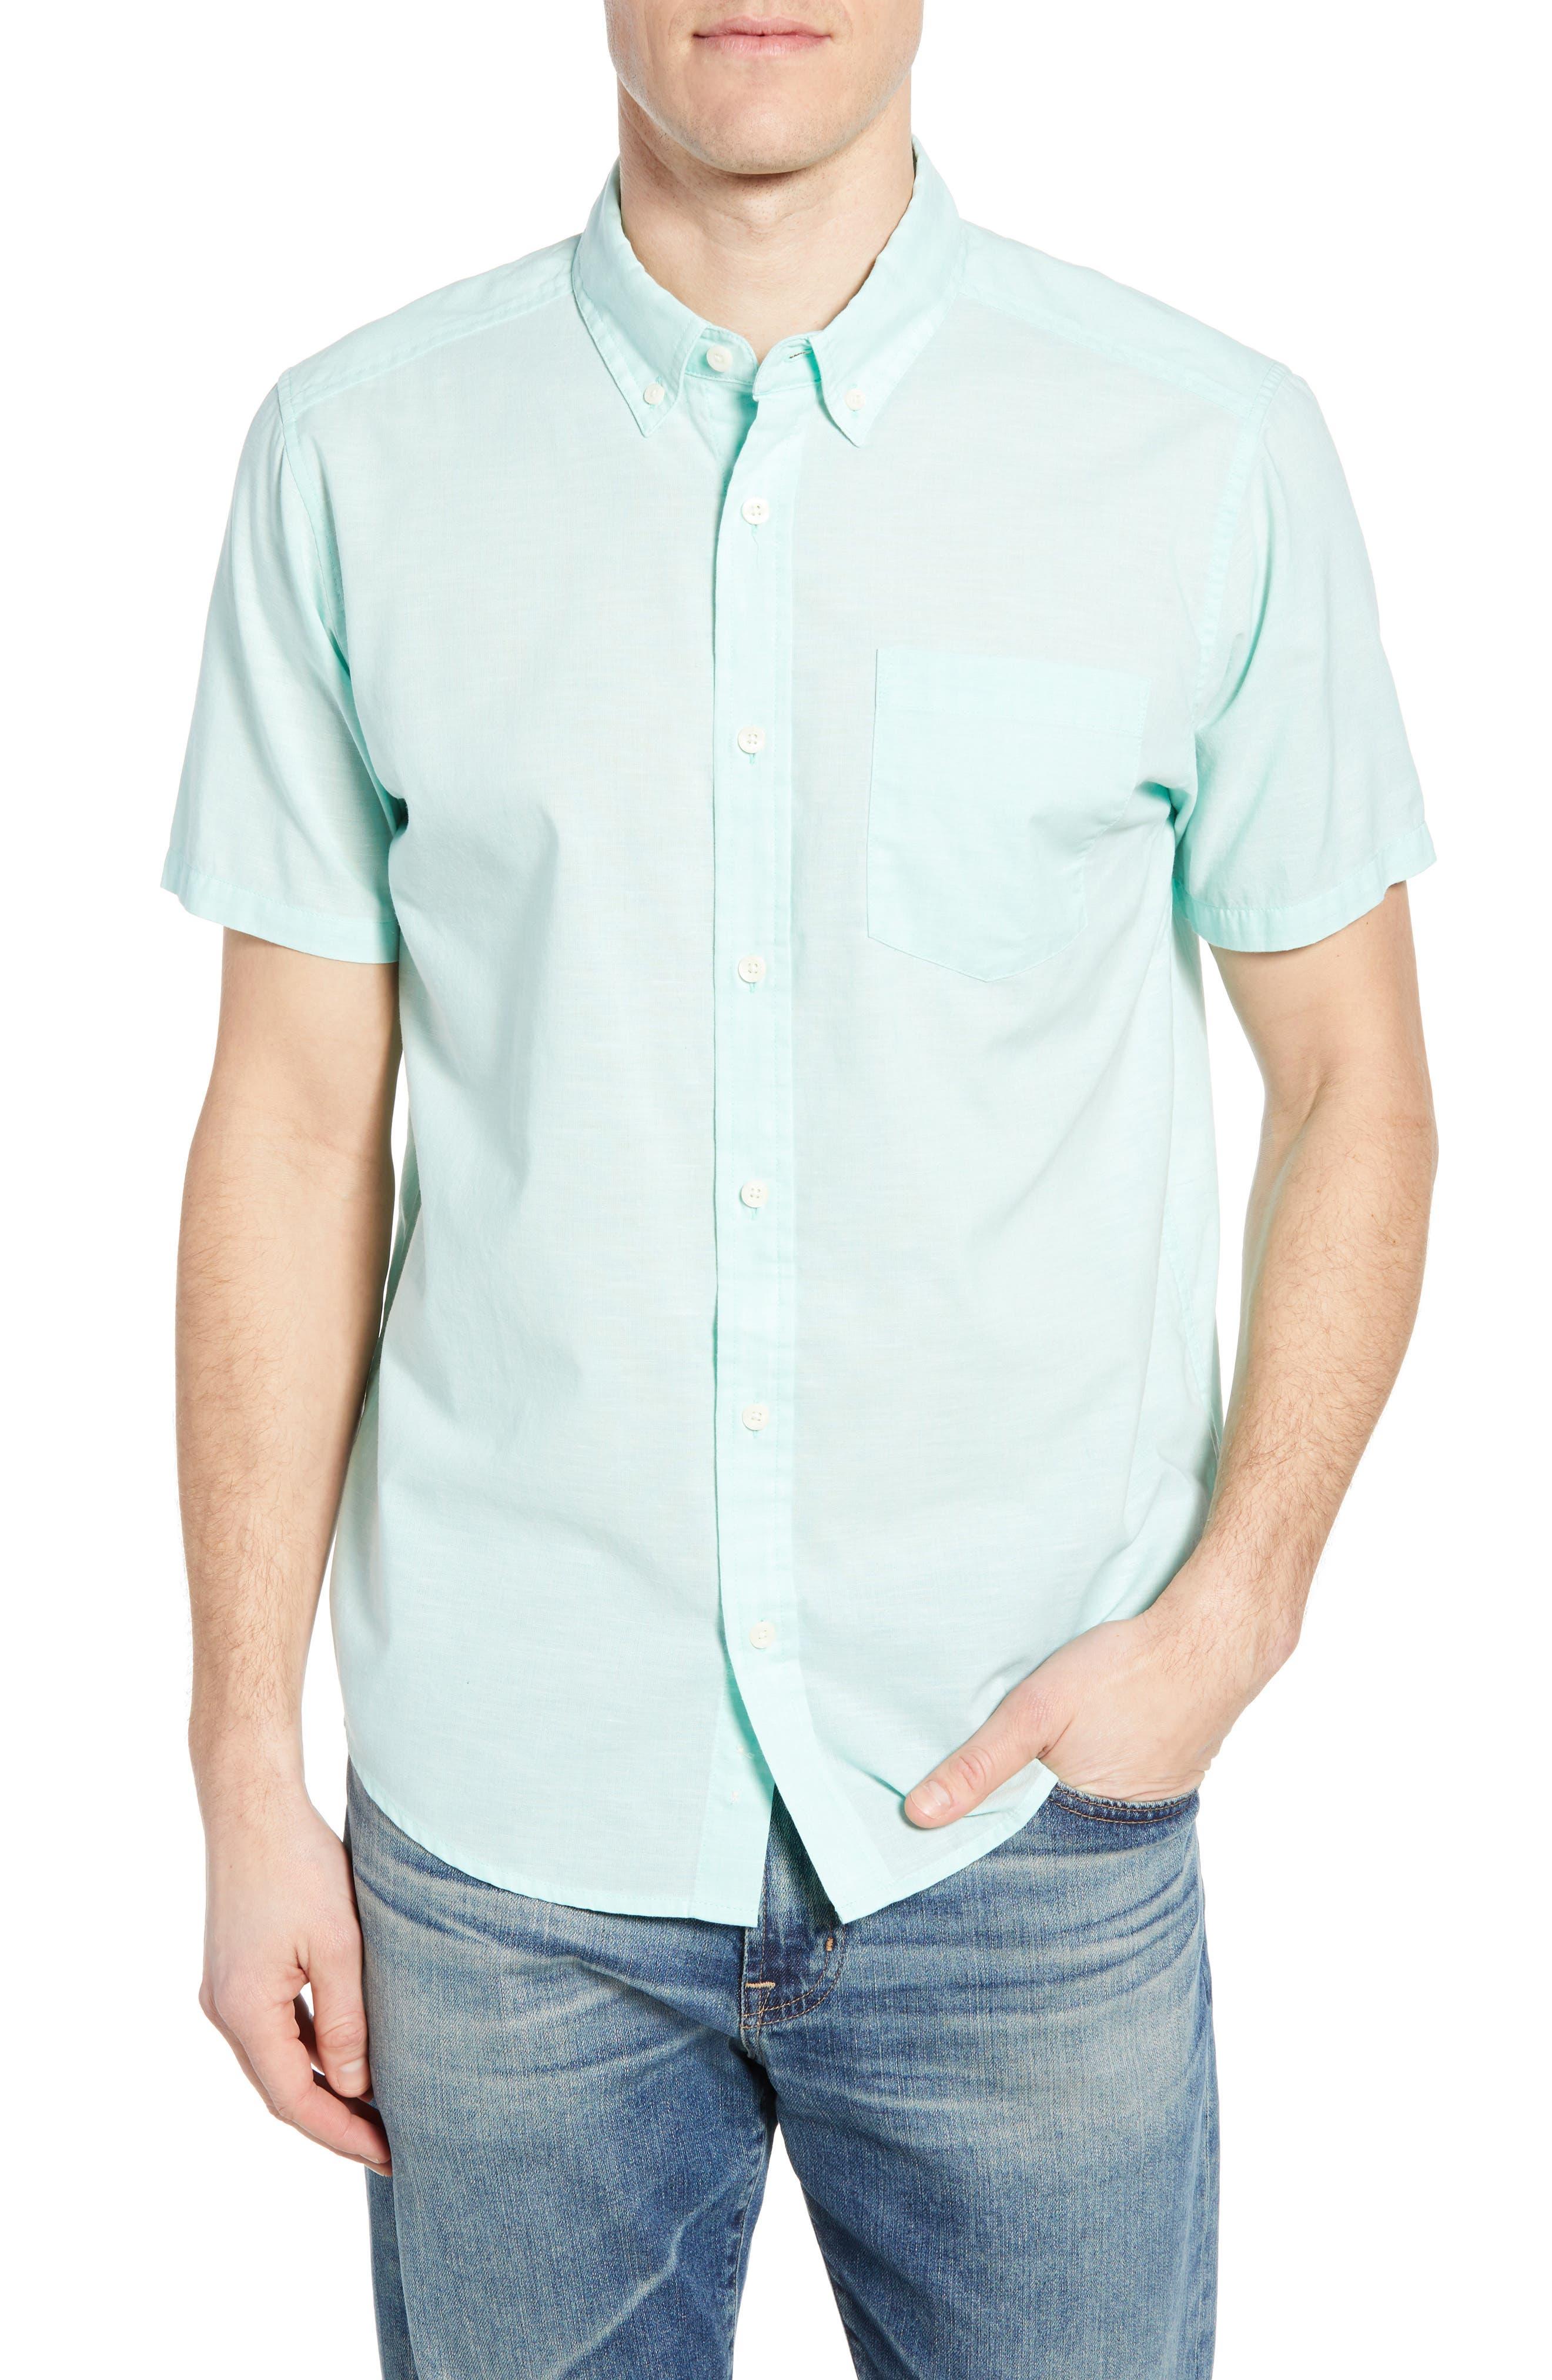 Bluffside Regular Fit Shirt, Main, color, CHAMBRAY VJOSA GREEN